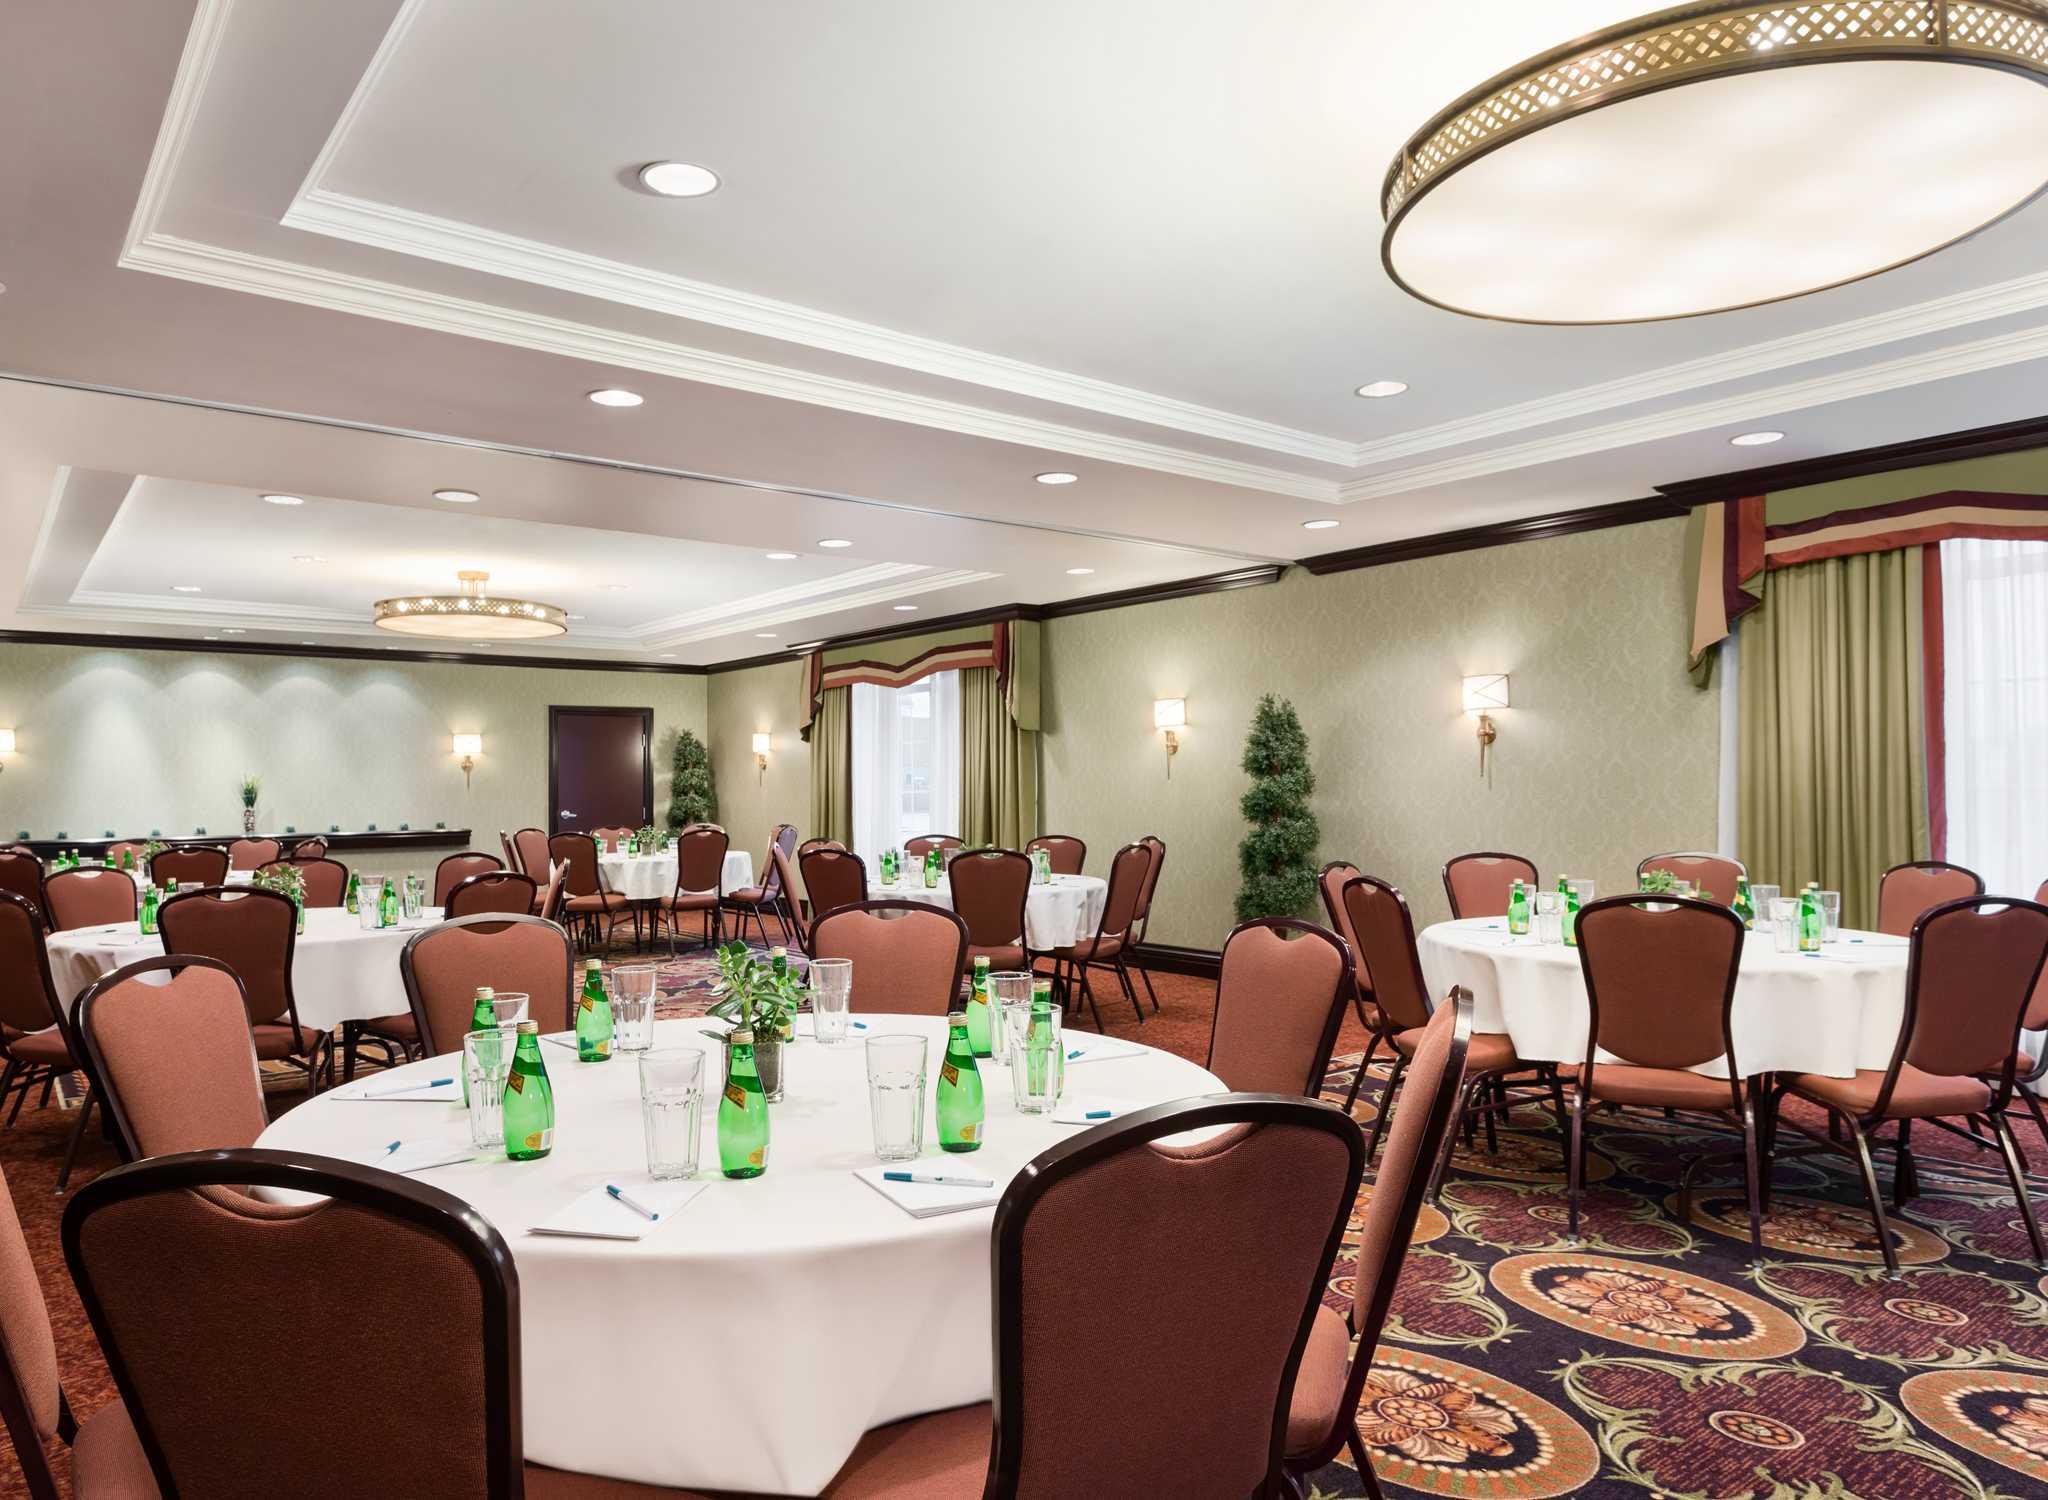 Hilton Garden Inn Kitchener Cambridge Ontario Hotels Homewood Suites By Hilton Cambridge